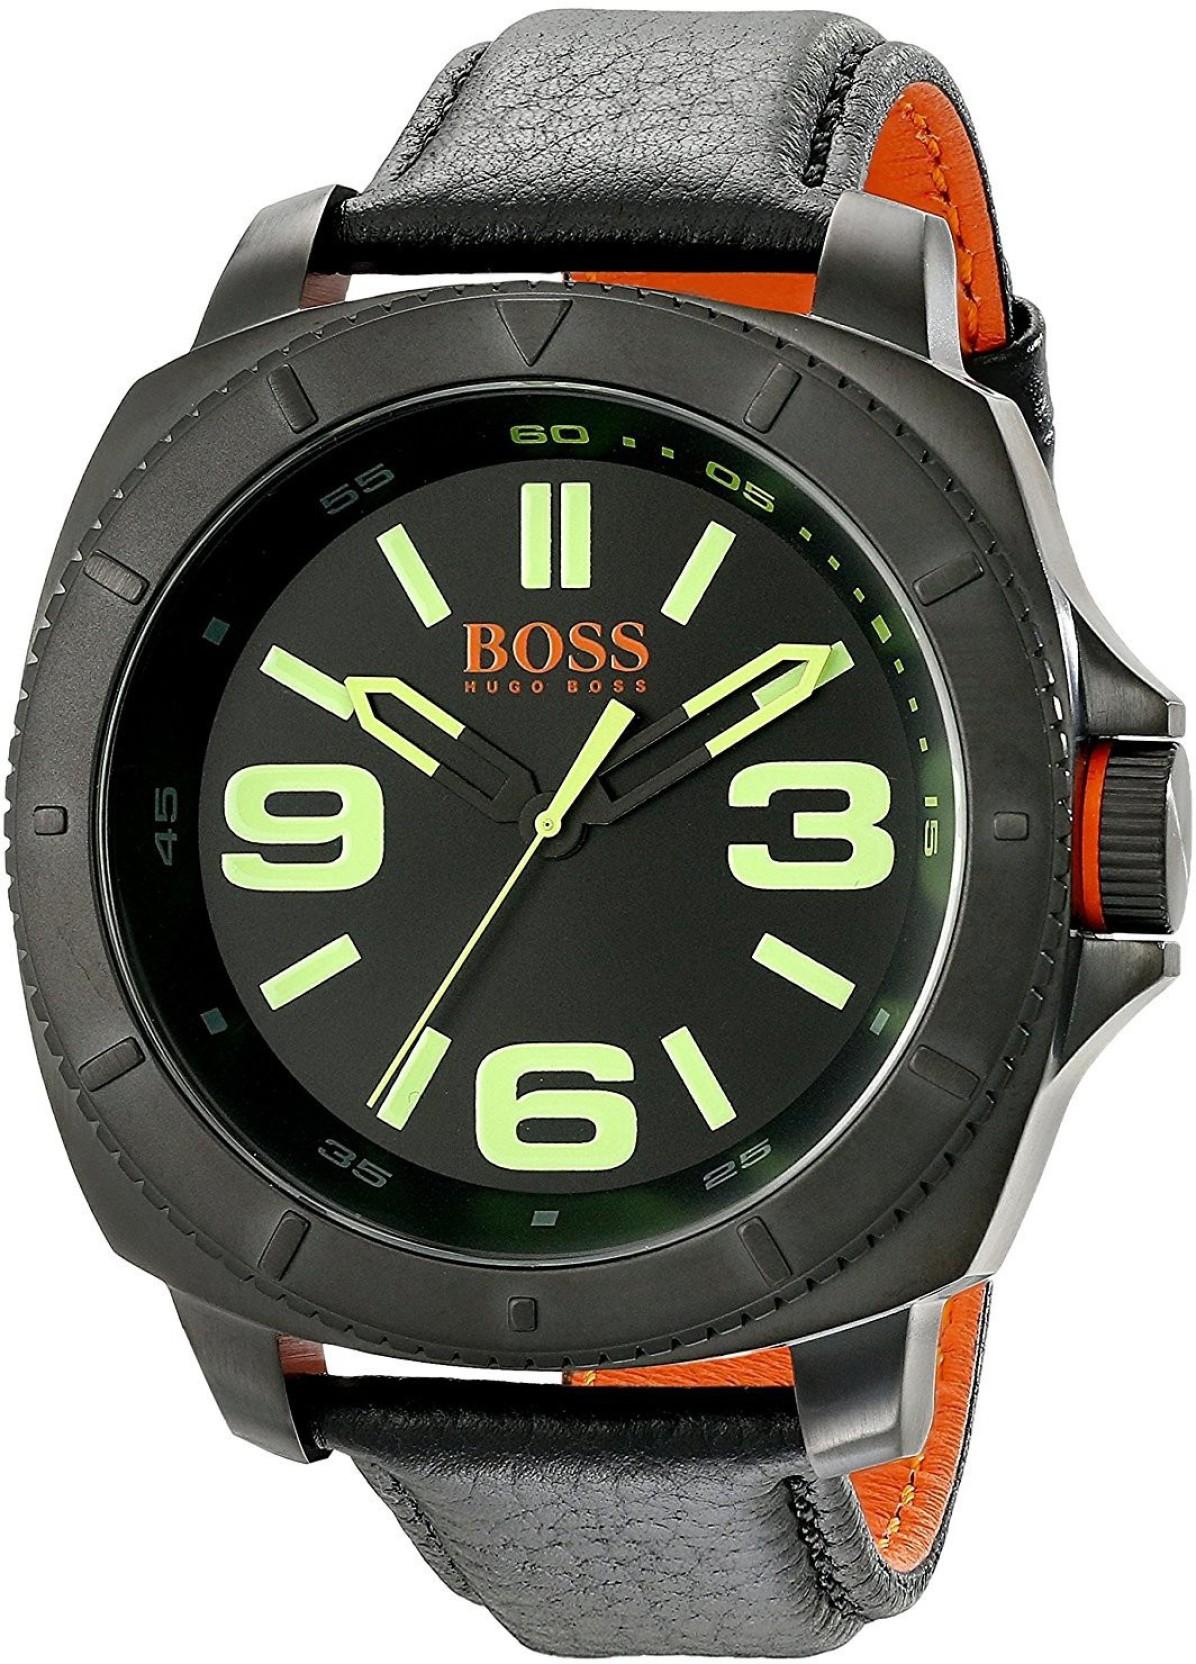 9e0ff7b98552 Hugo Boss Black1204 BOSS Orange Men s 1513163 Sao Paulo Analog ...